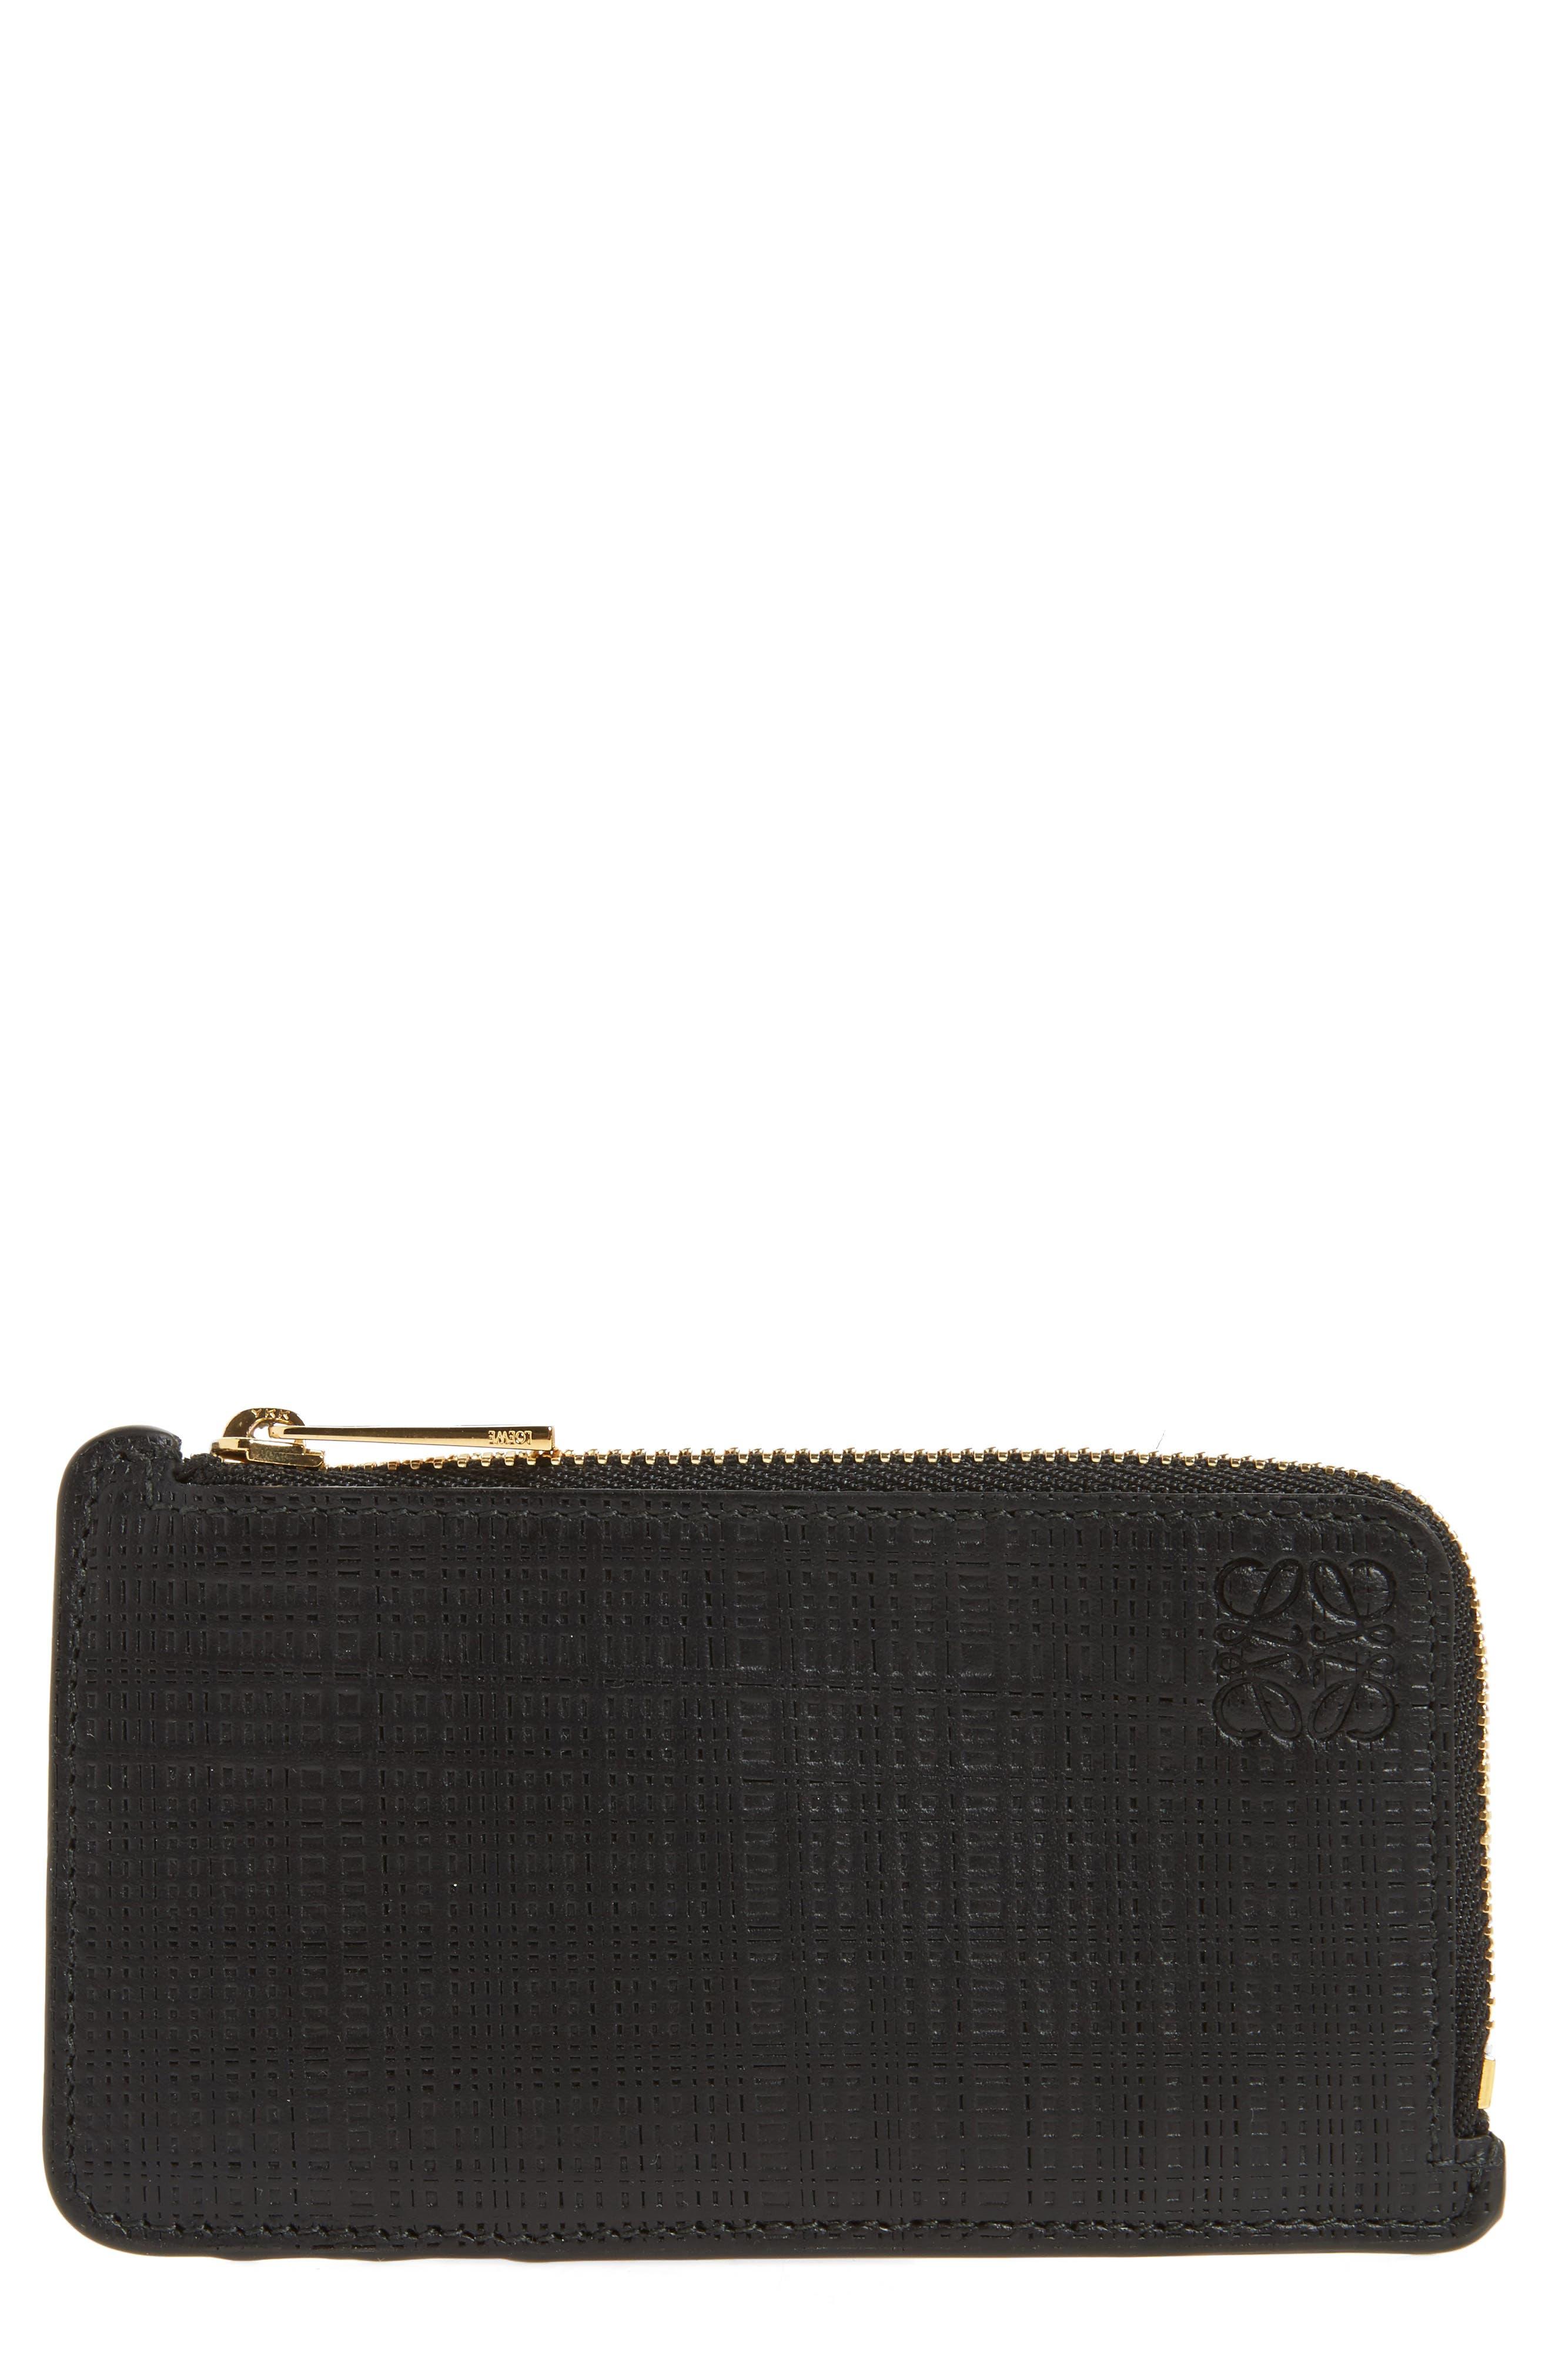 Calfskin Leather Zip Wallet,                         Main,                         color, 001